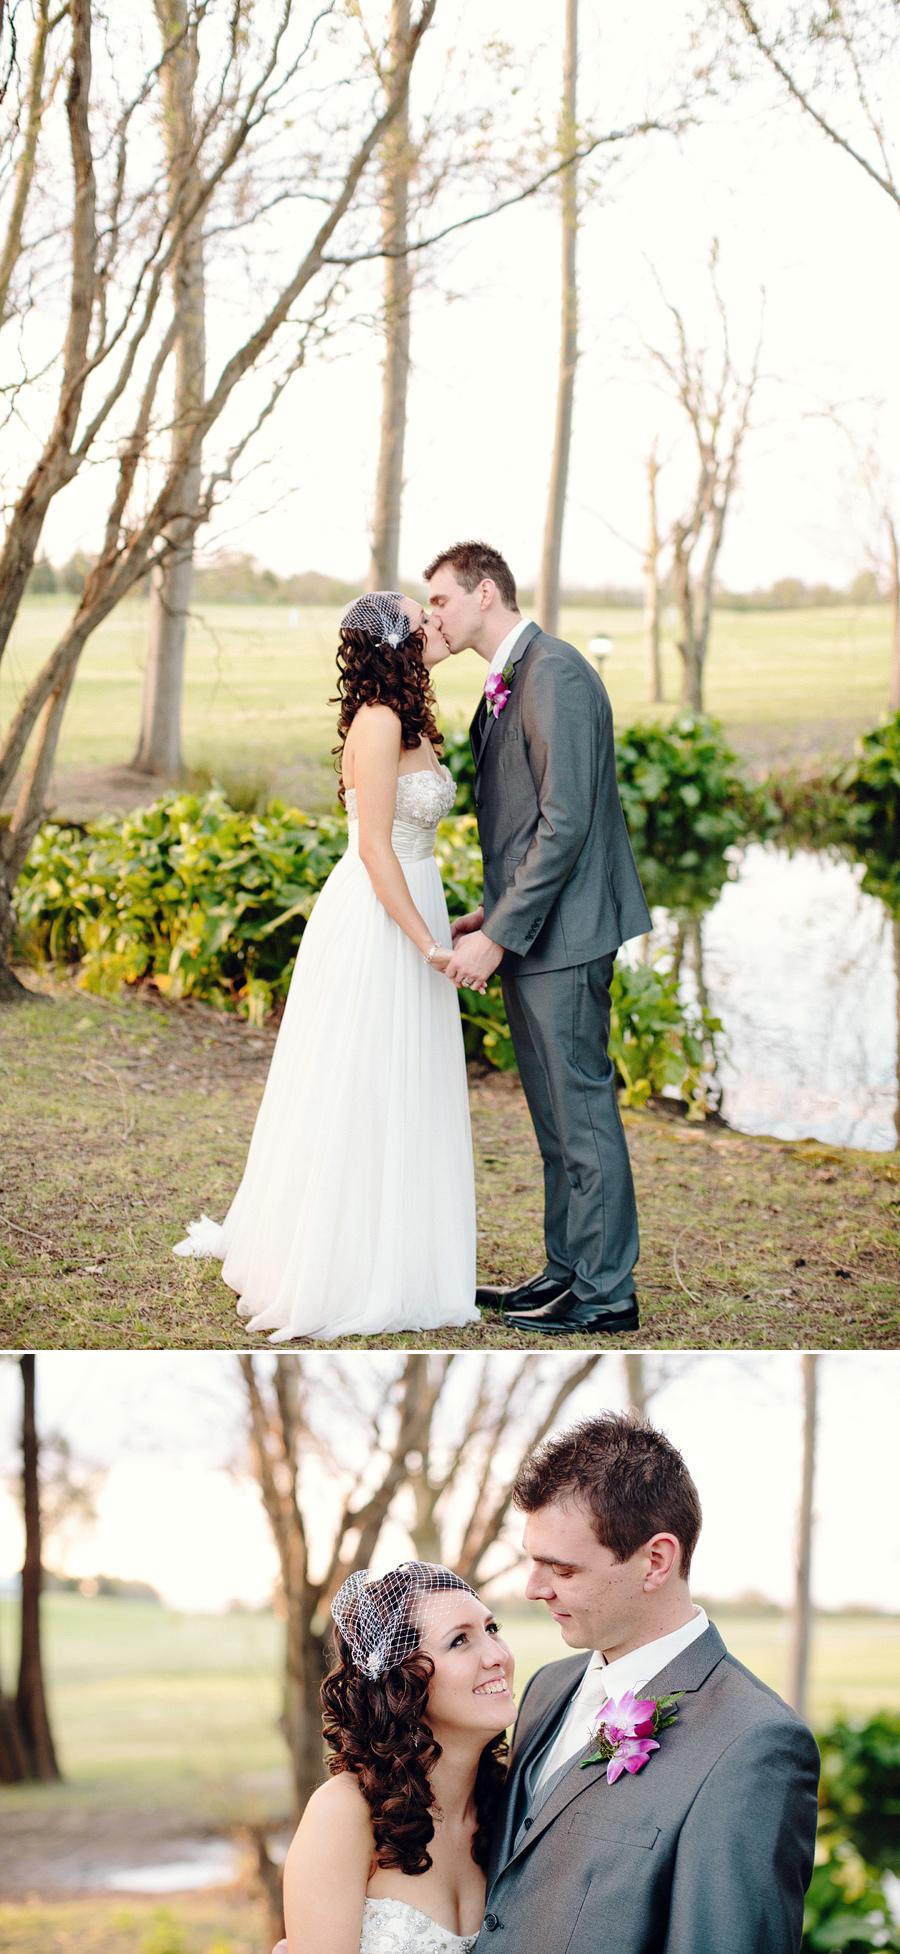 Sydney Wedding Photography: Bridal portraits